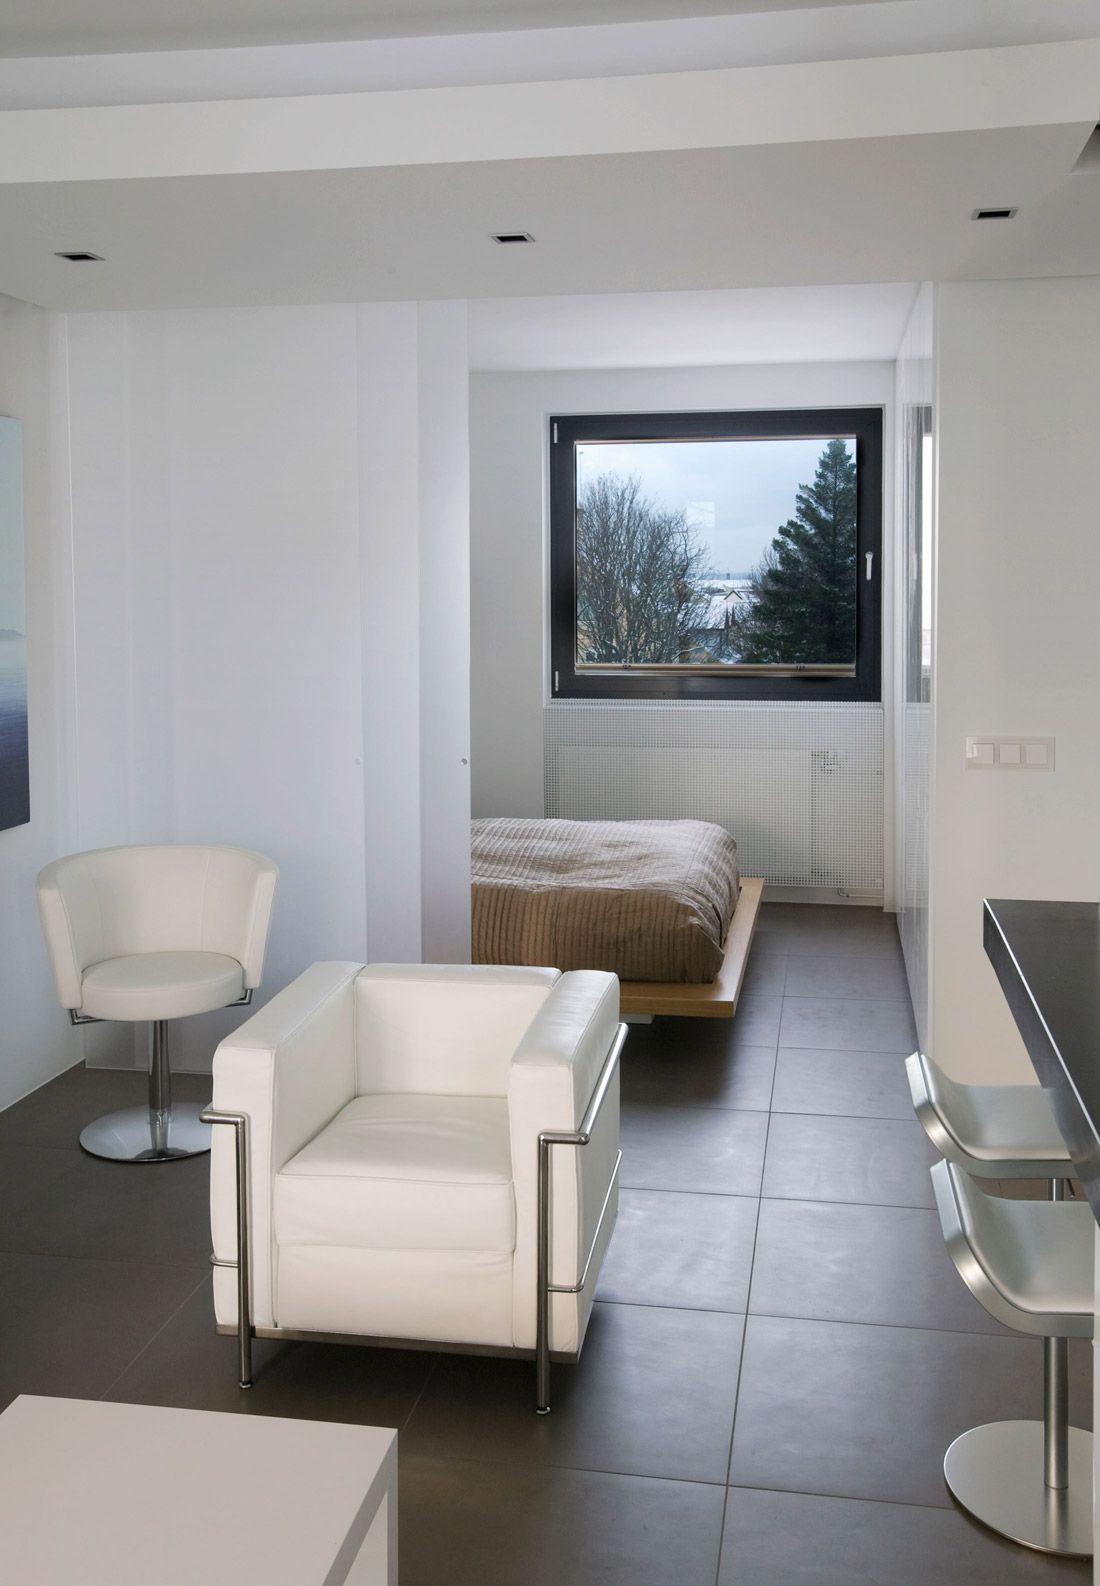 Bedroom living space modern apartment in reykjavik iceland